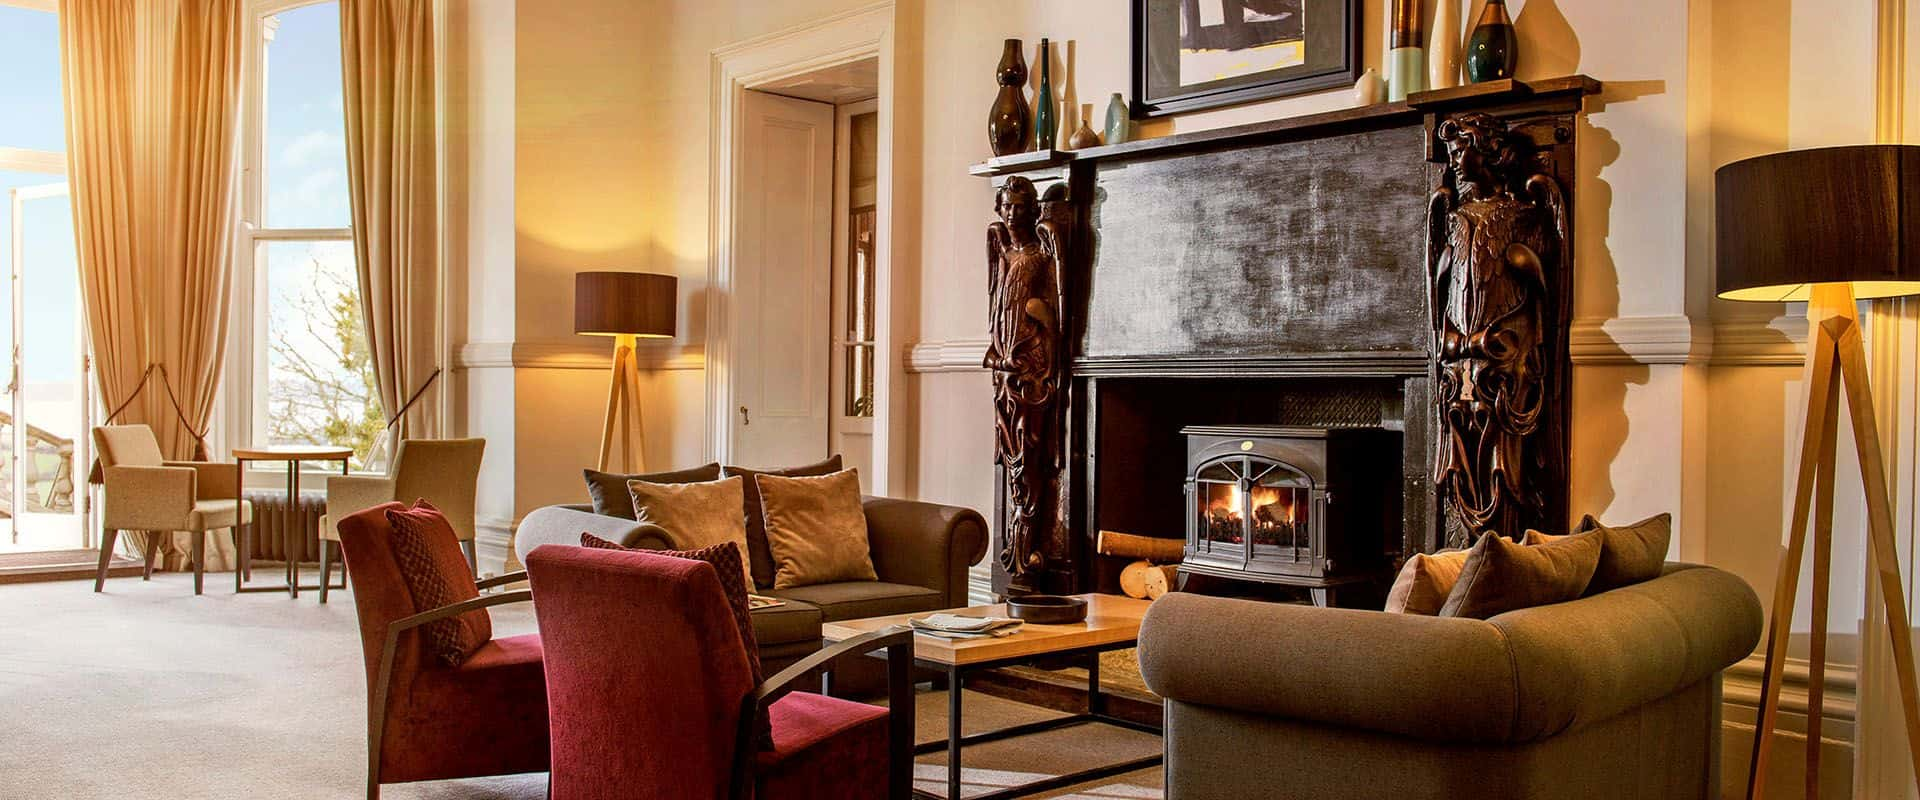 Trenython Manor fireplace